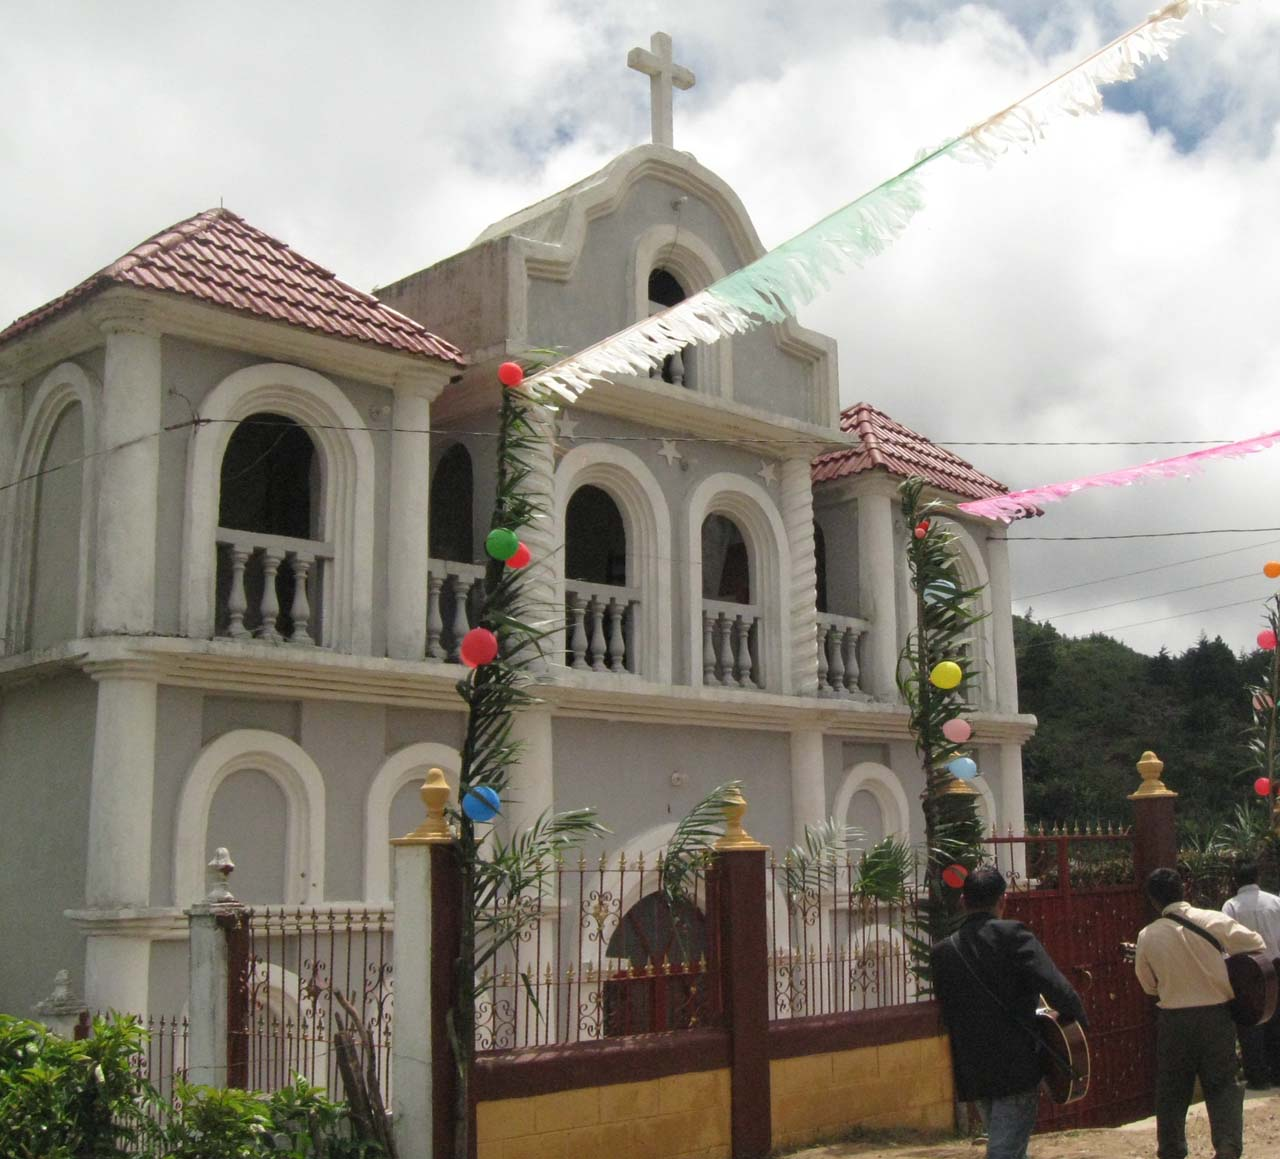 The parish in Aguacate